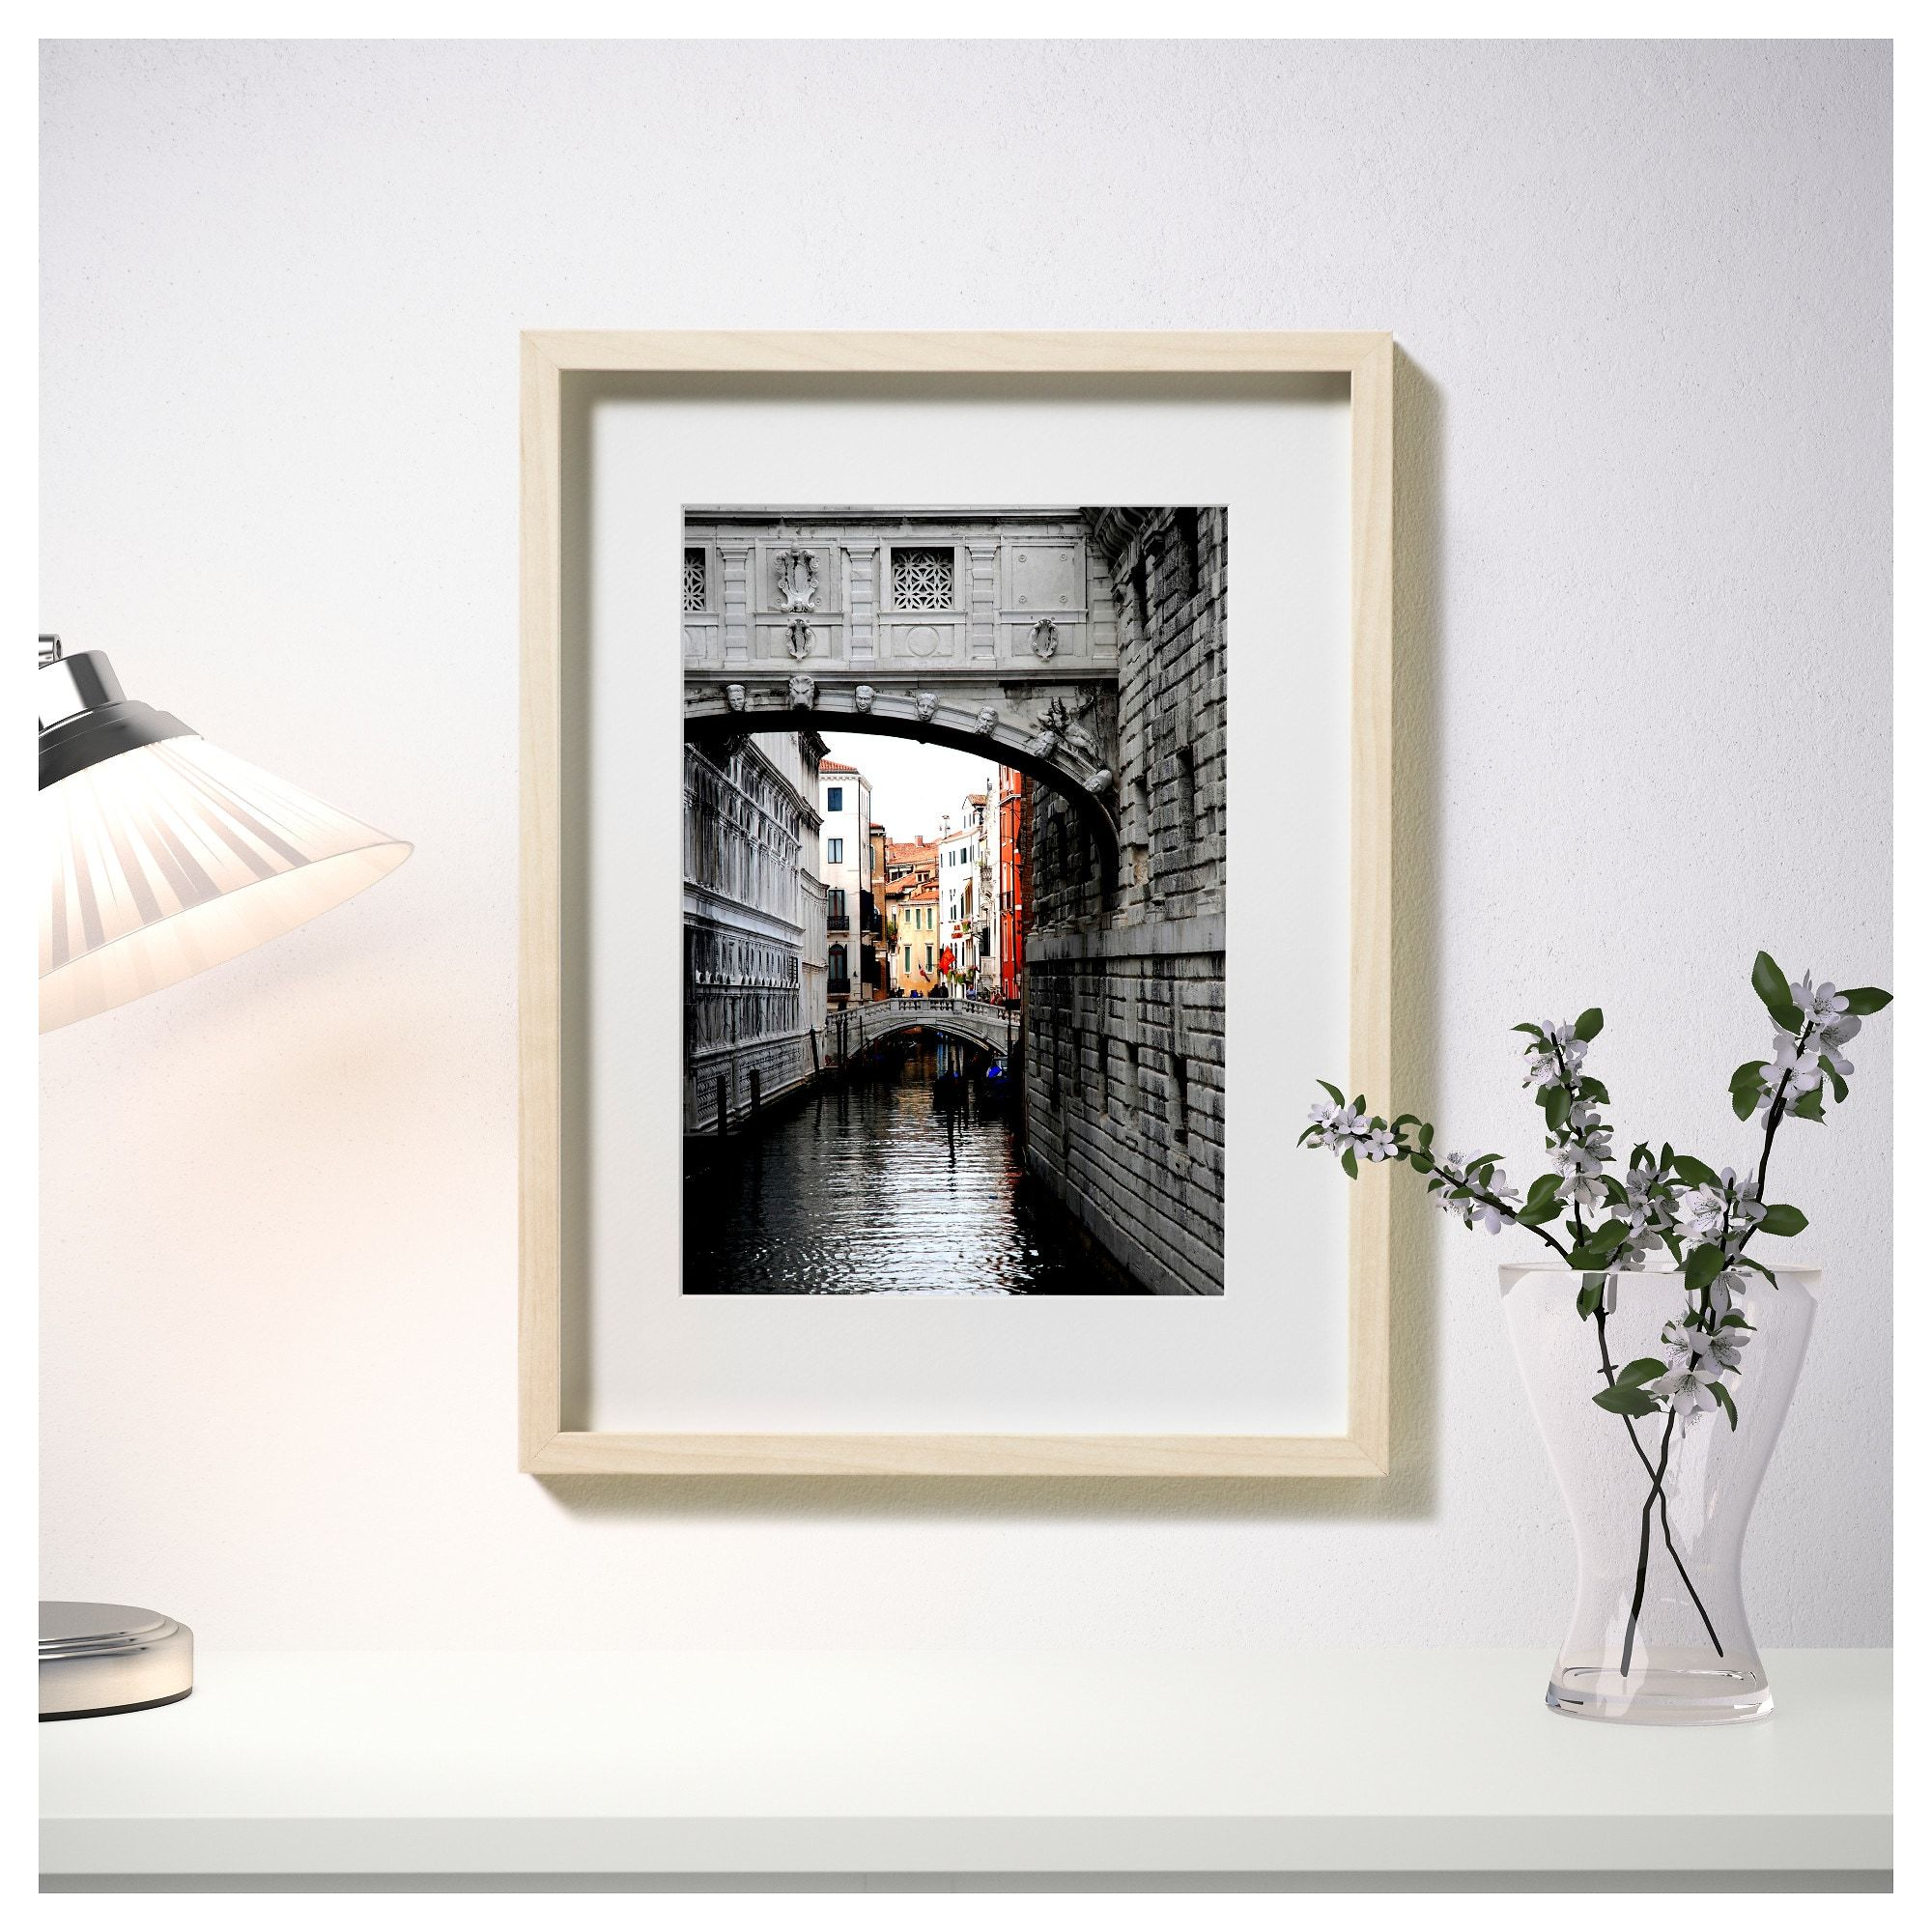 IKEA HOVSTA Frame birch effect Ikea picture frame